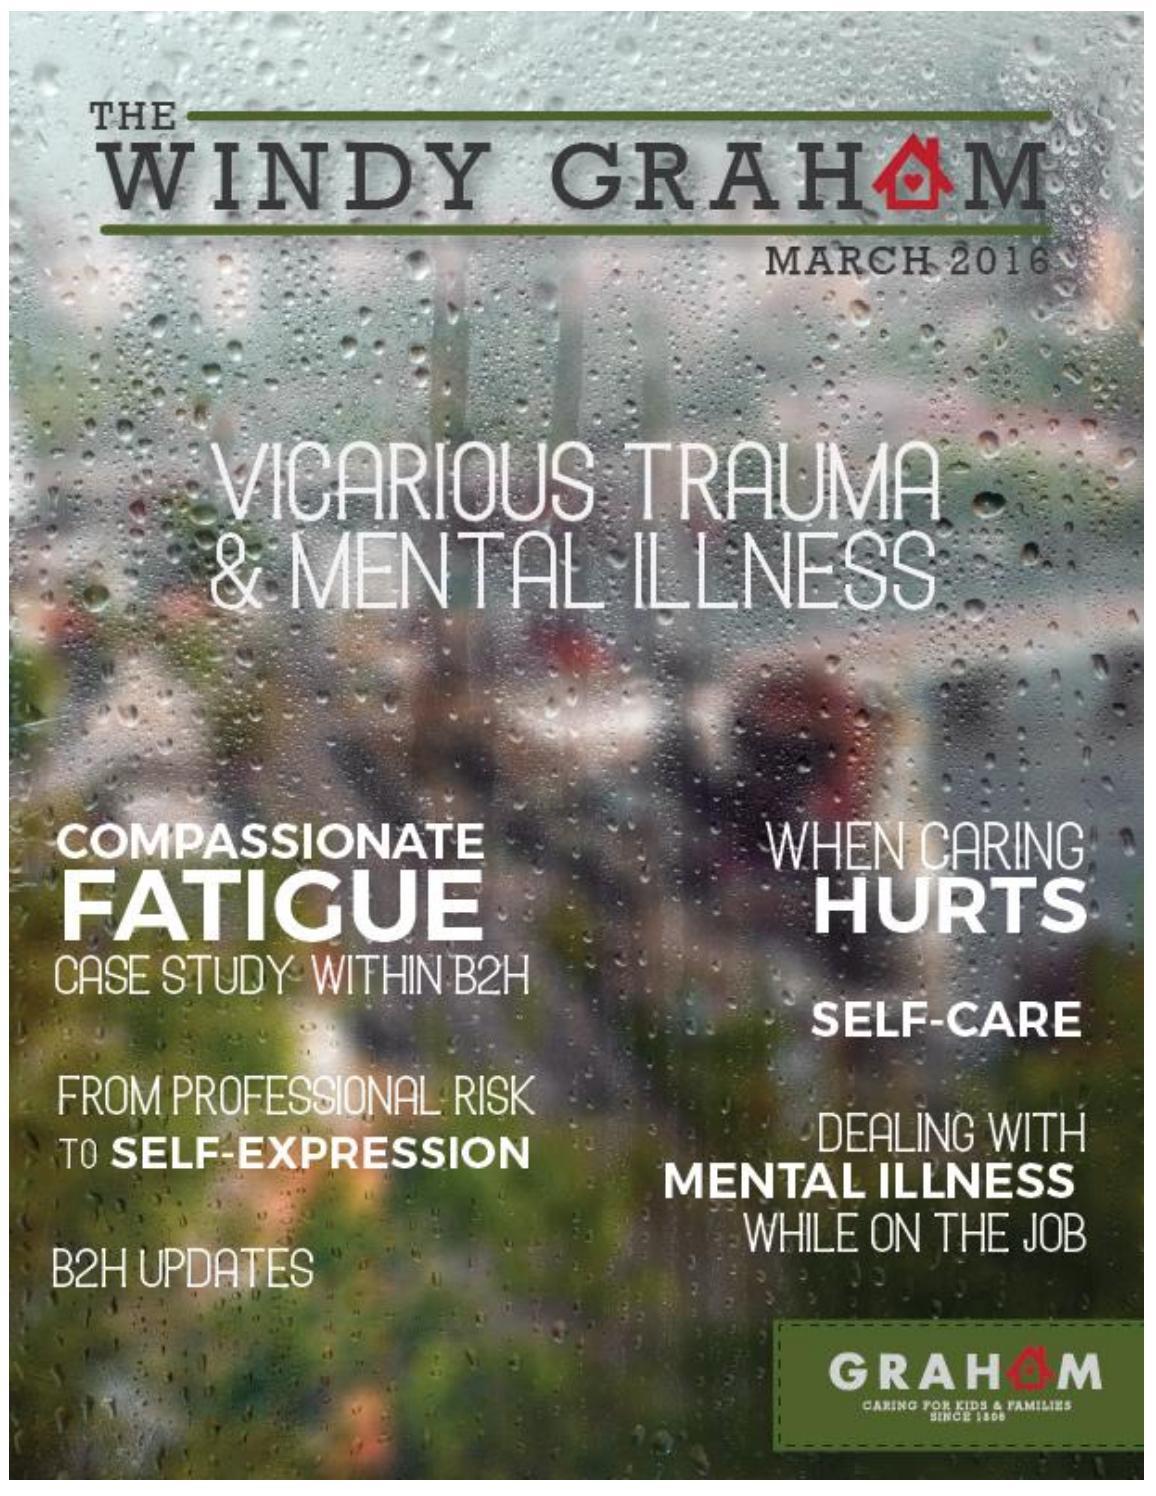 Windy graham march 2016 by O'Brien Dennis Initiative - issuu